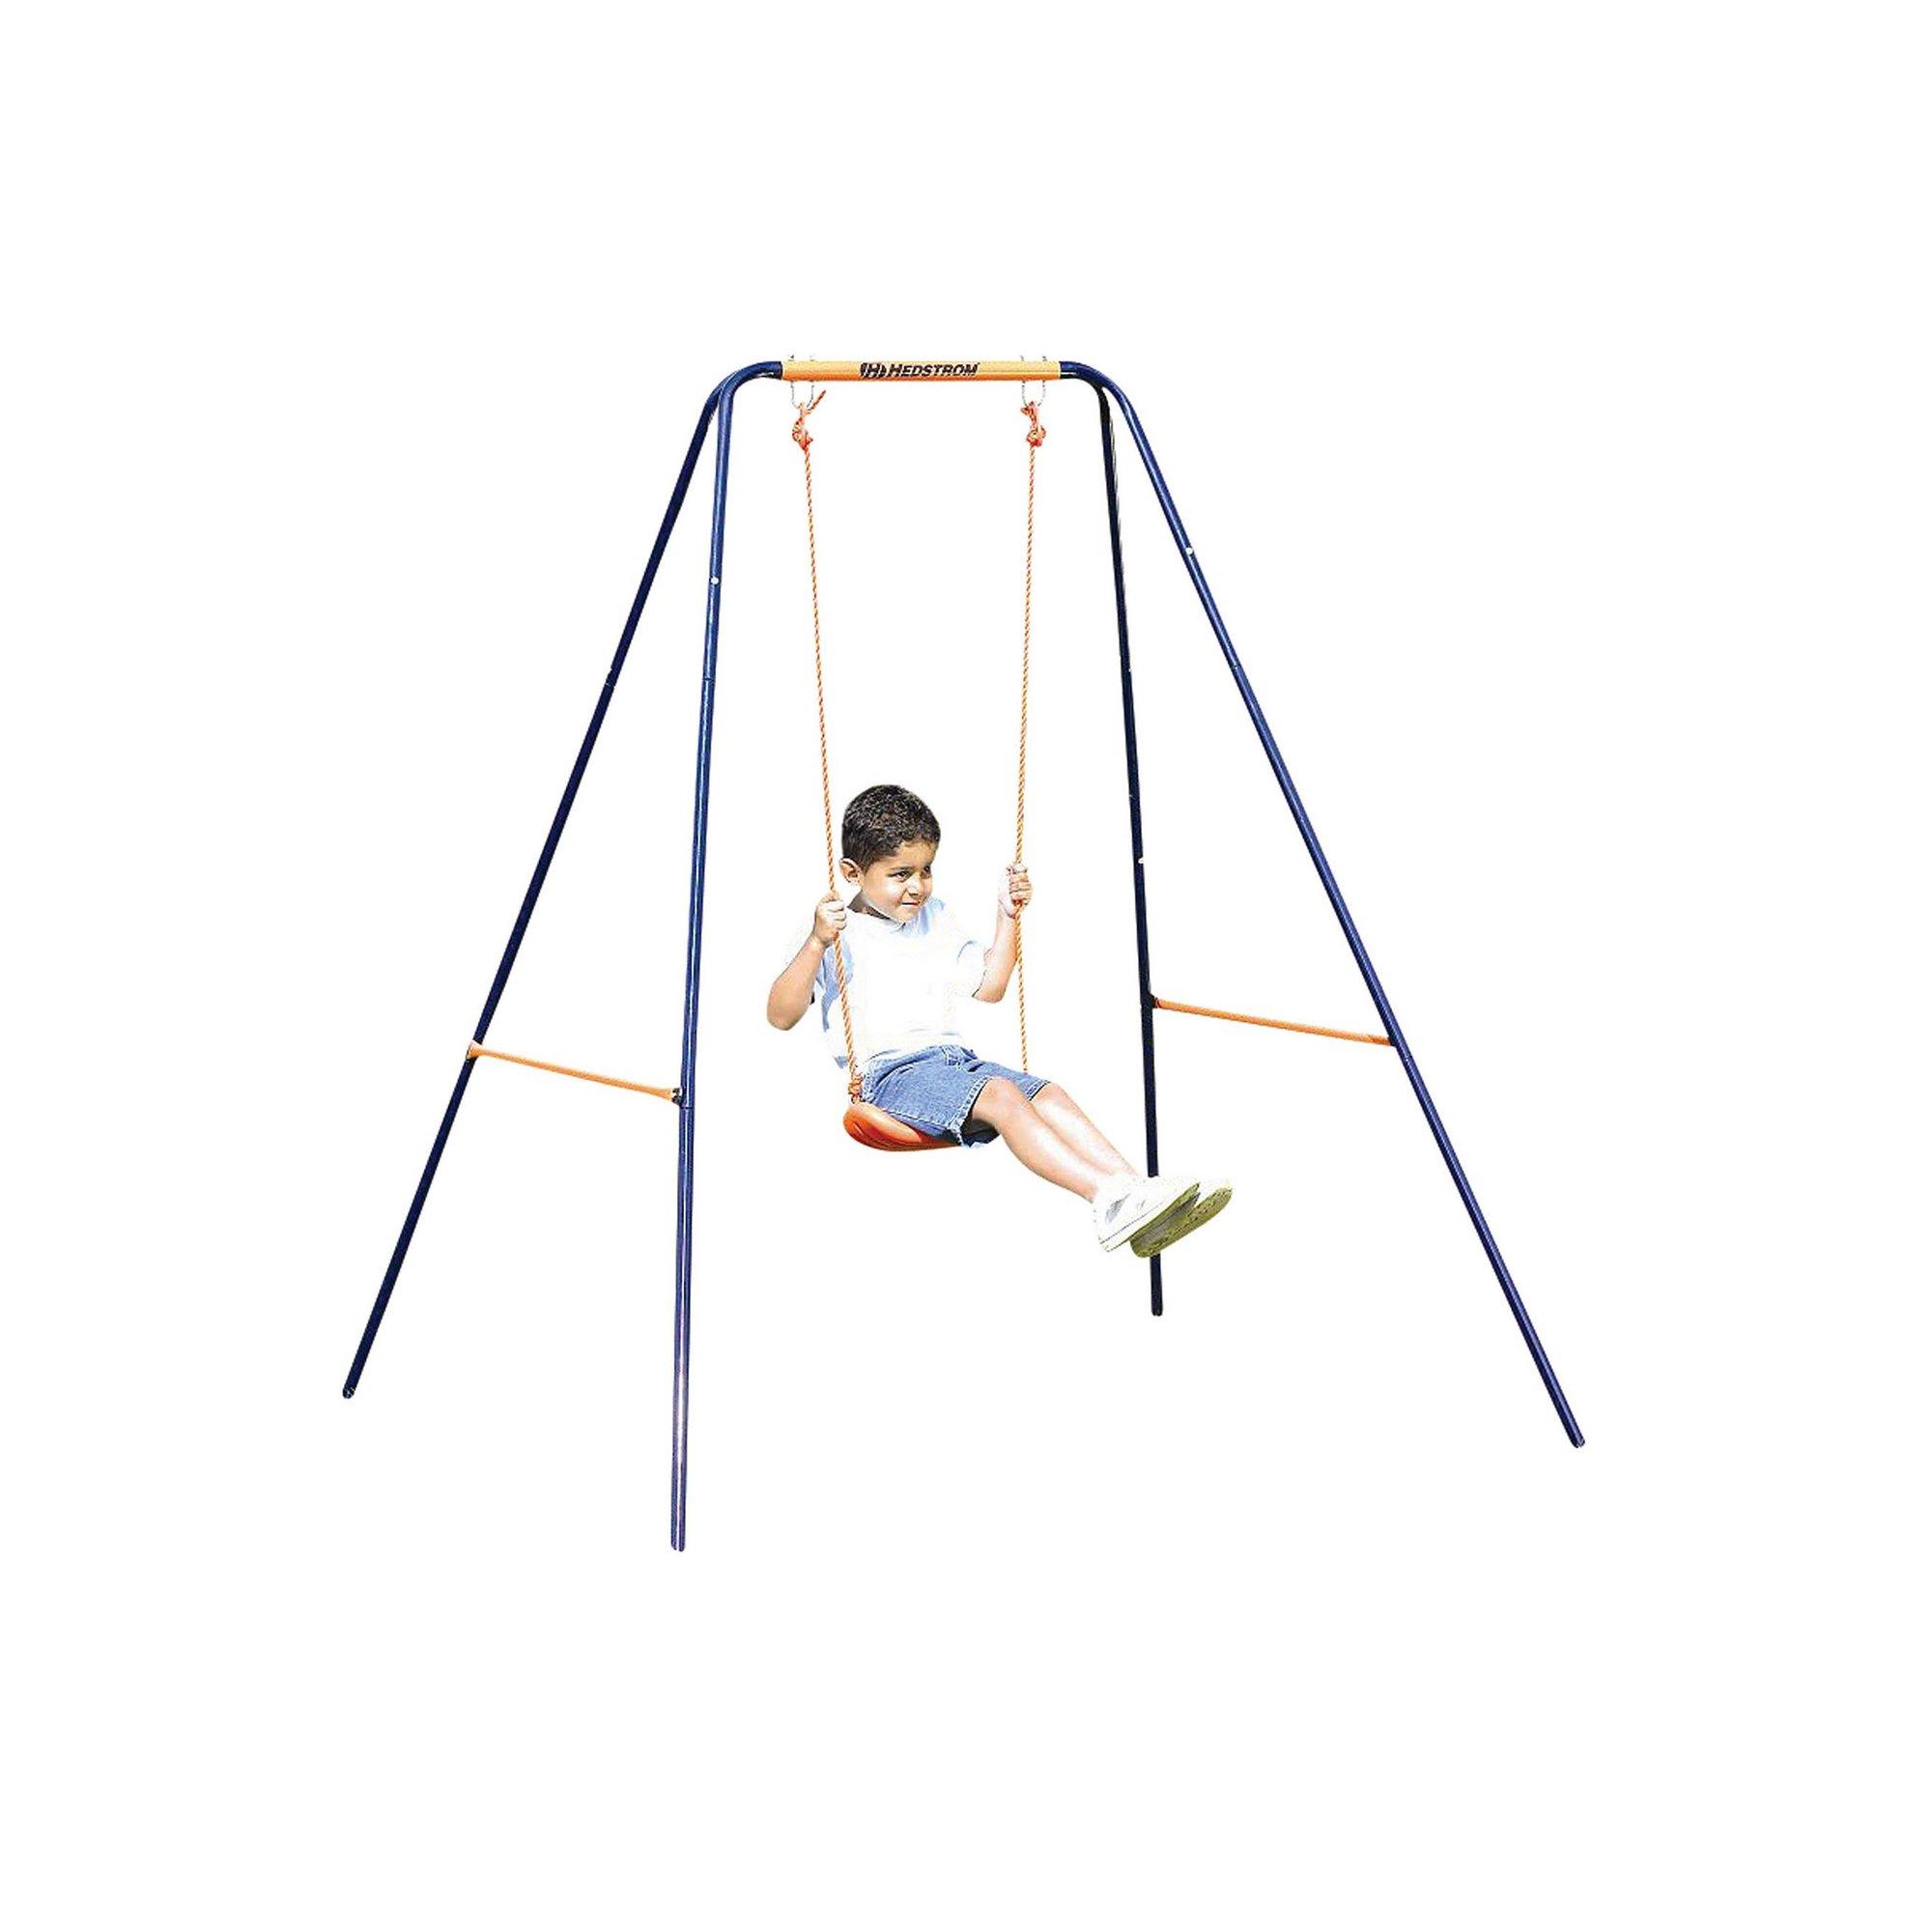 Image of Hedstrom Deluxe 2 in 1 Swing